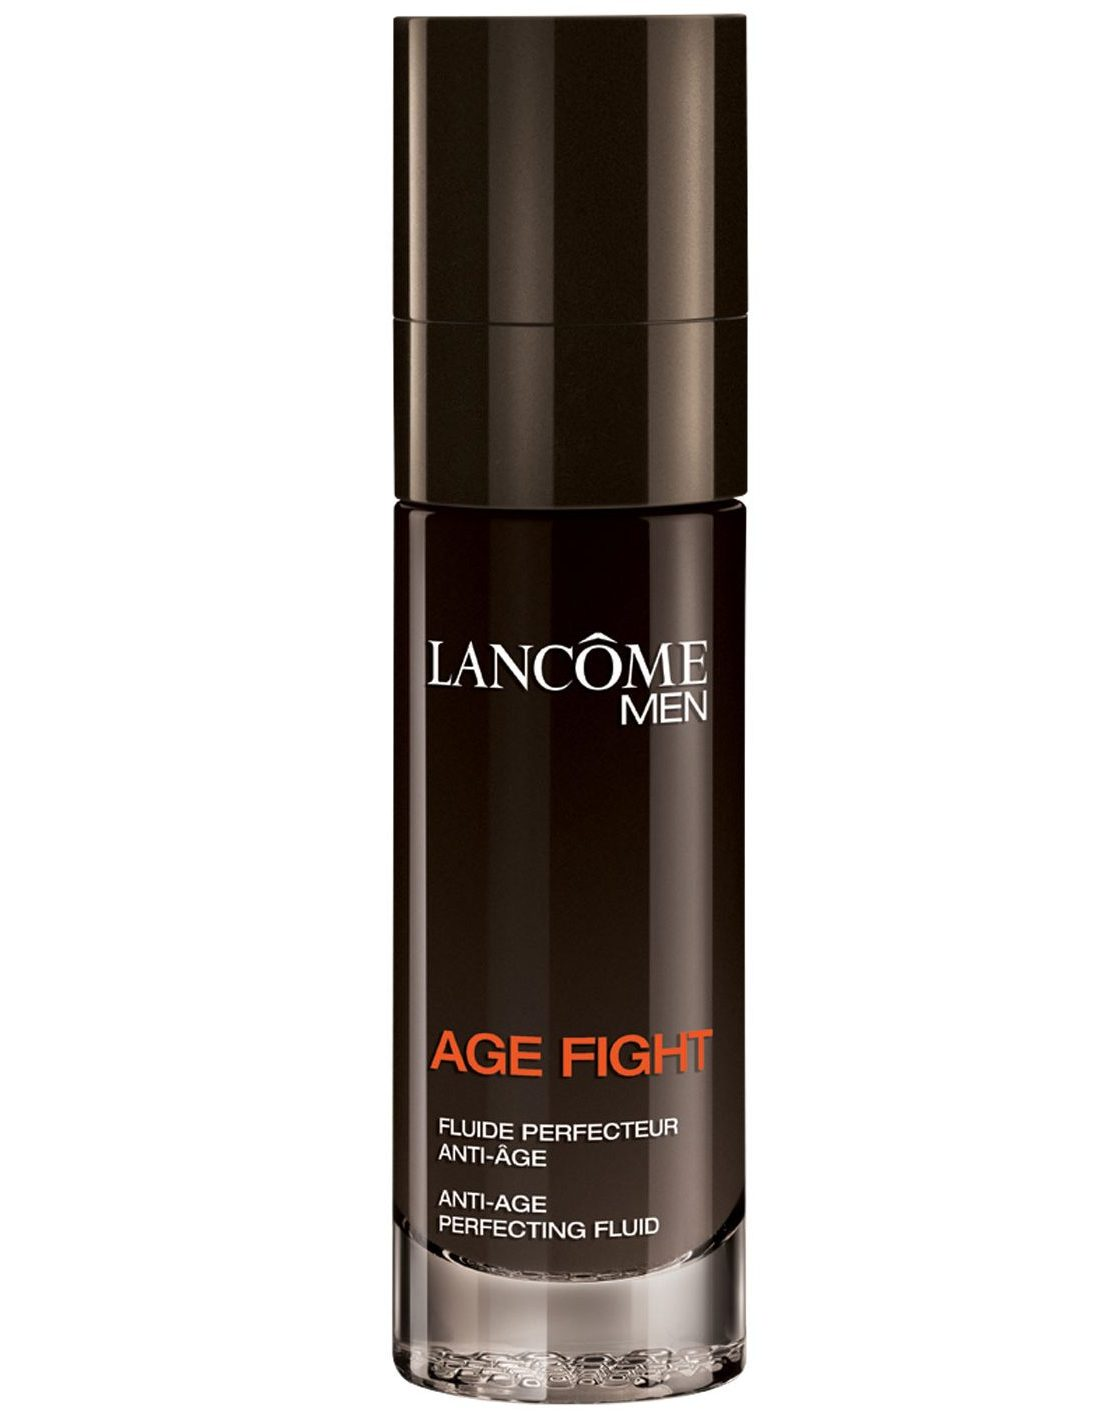 Lancome Men Age Fight Fluid